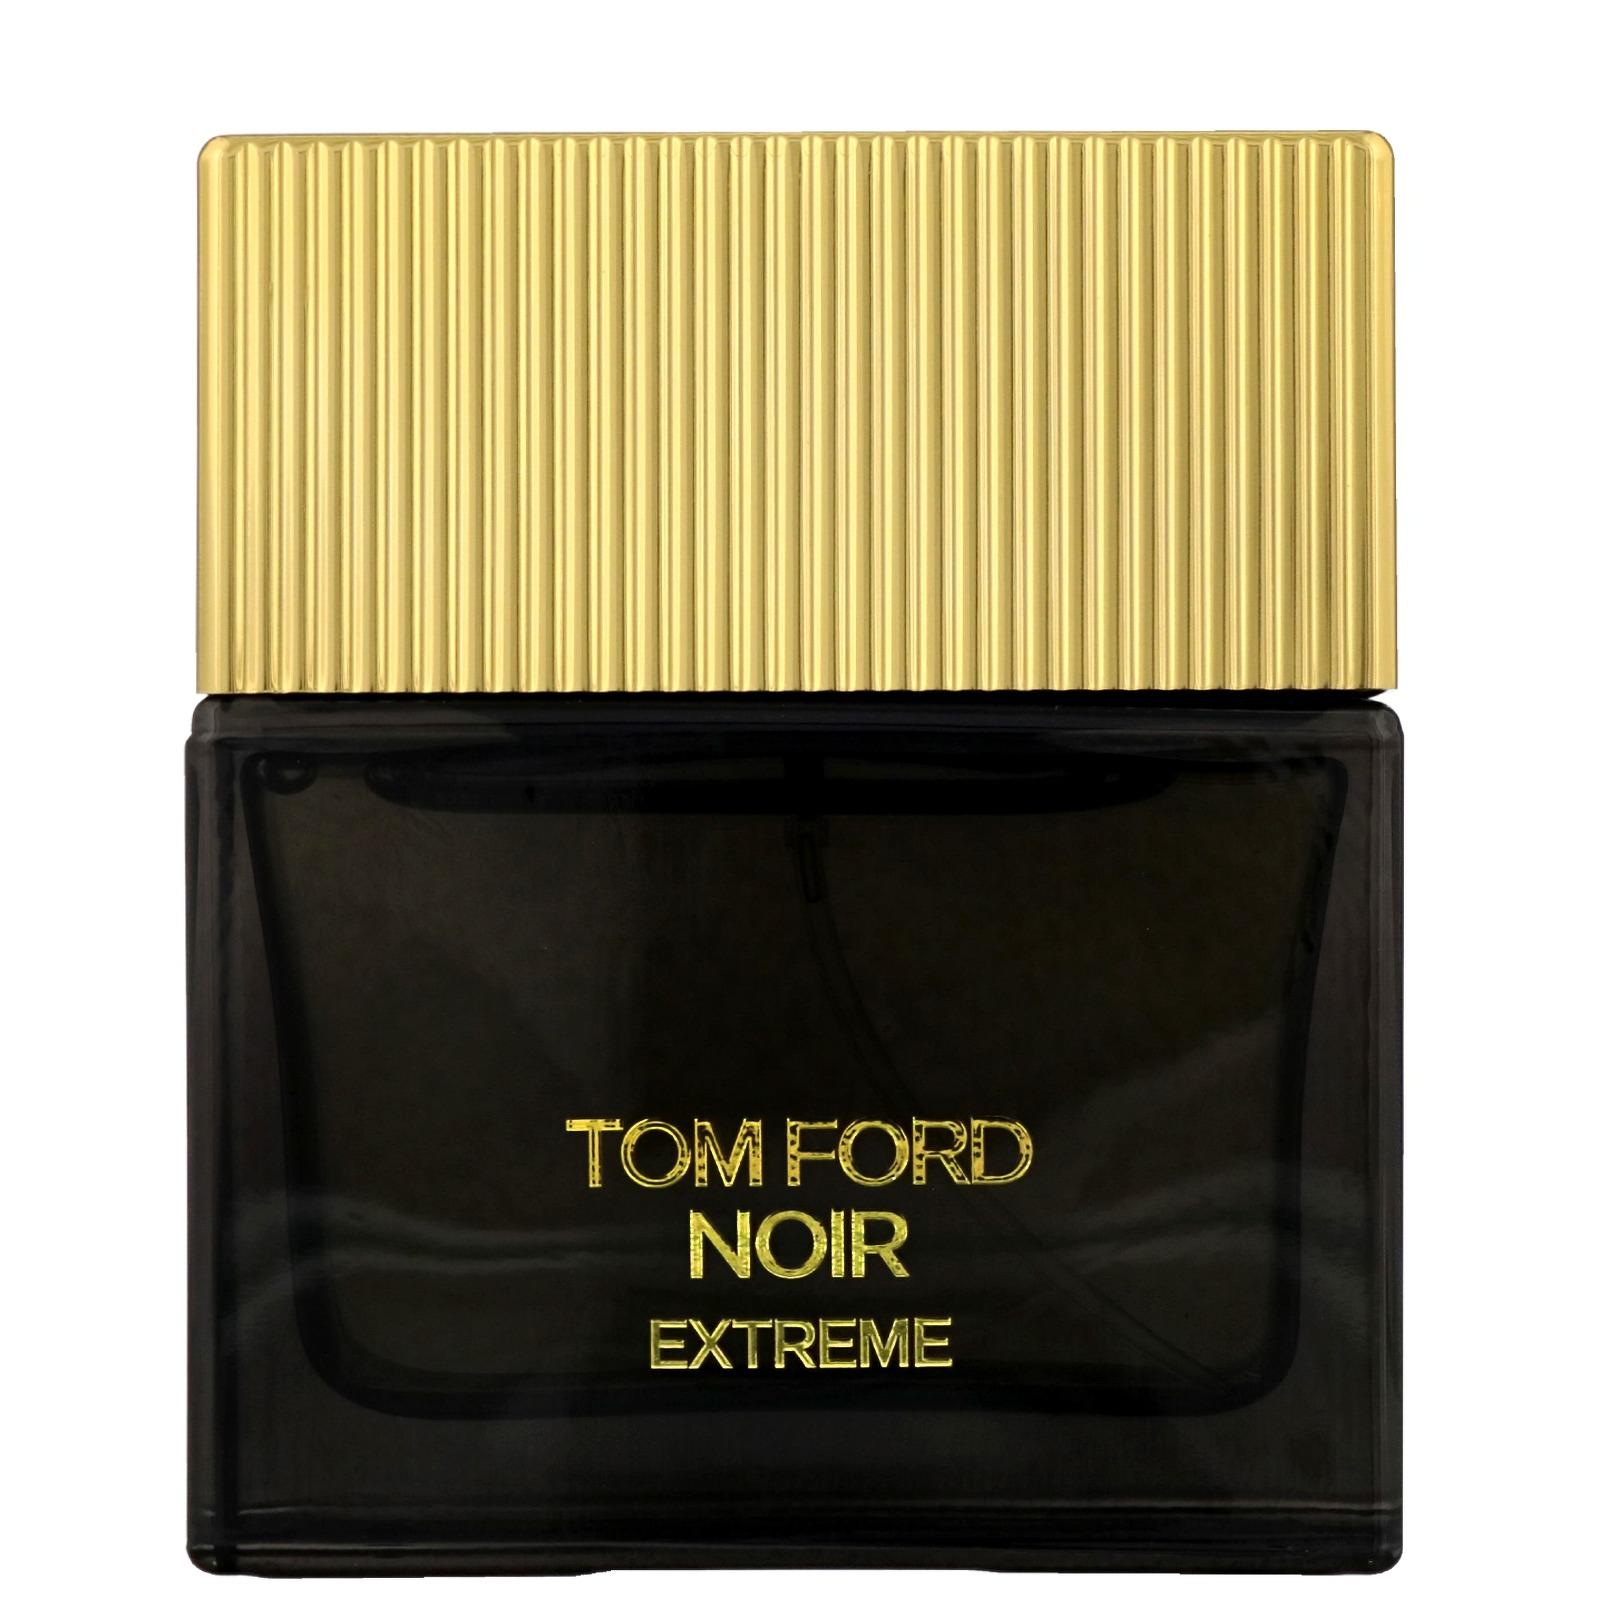 Tom Ford Noir Extreme Eau de Parfum Spray 50ml £56.88 / 100ml £80.85 (With Code) @ Allbeauty